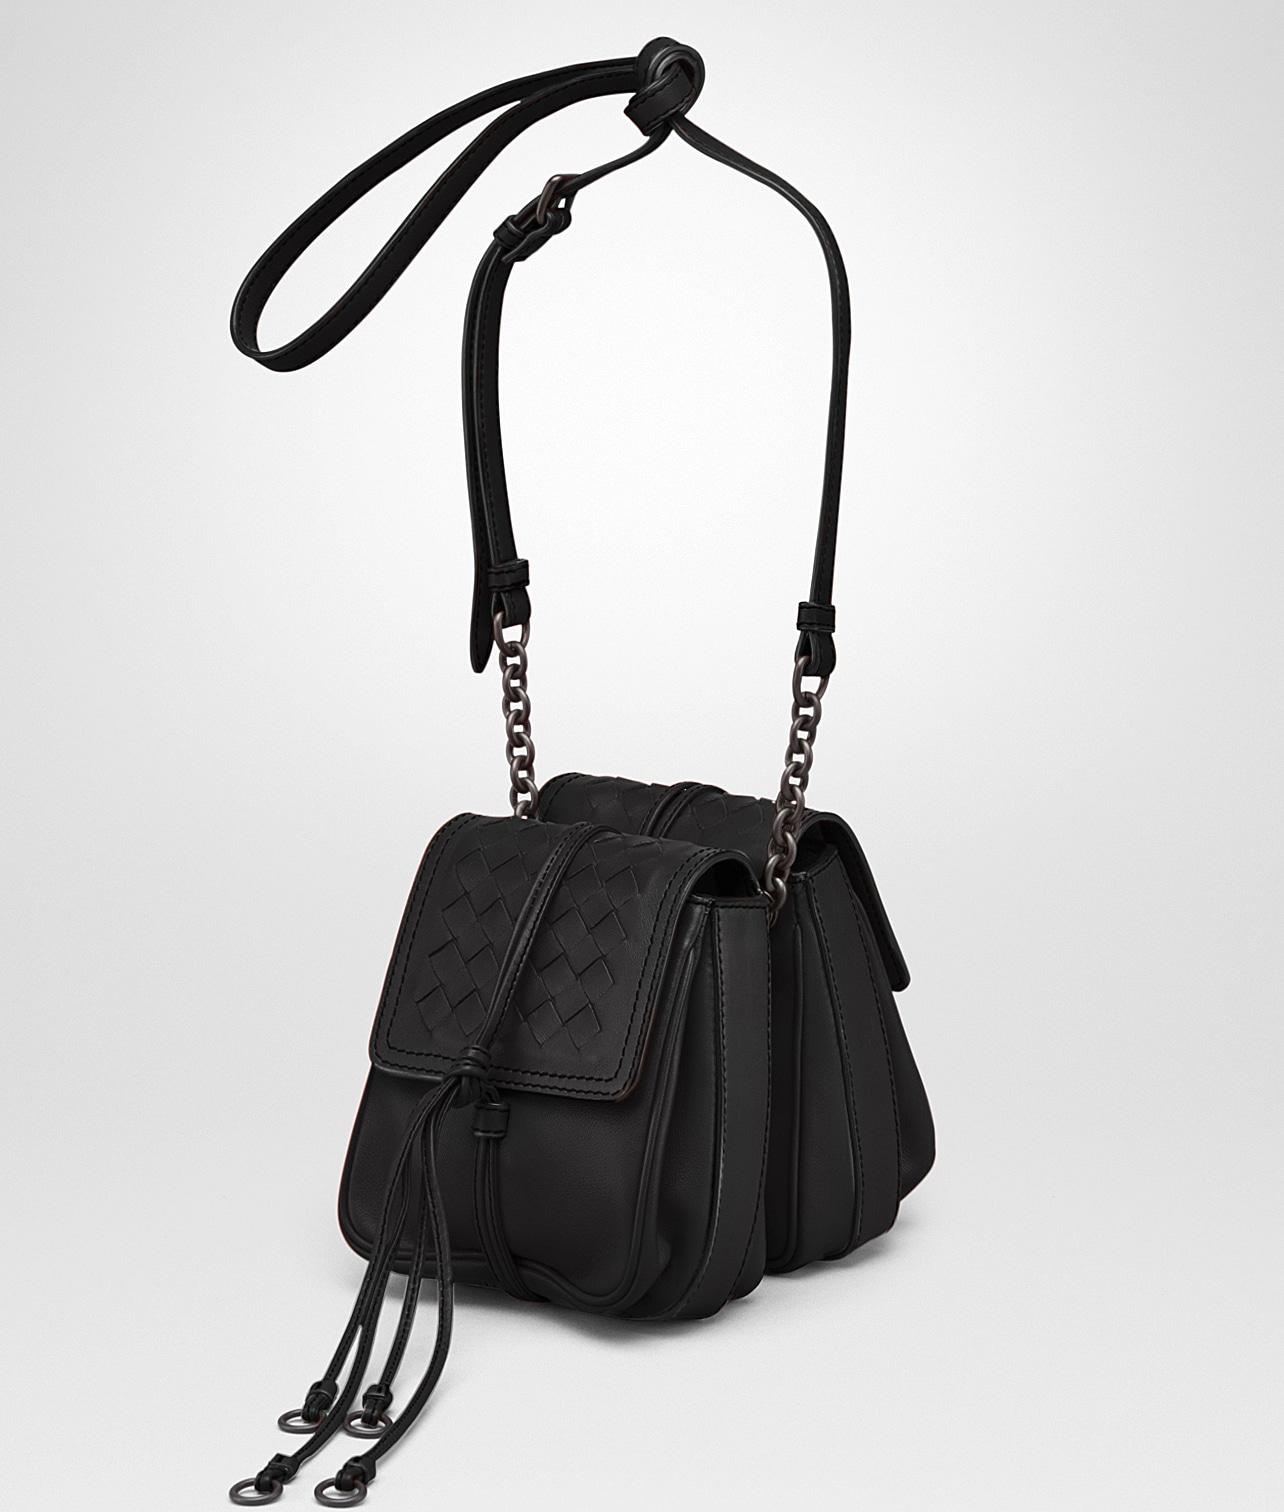 fc3ed4c049 Bottega Veneta Nero Nappa Intrecciato Double Micro Shoulder Bag